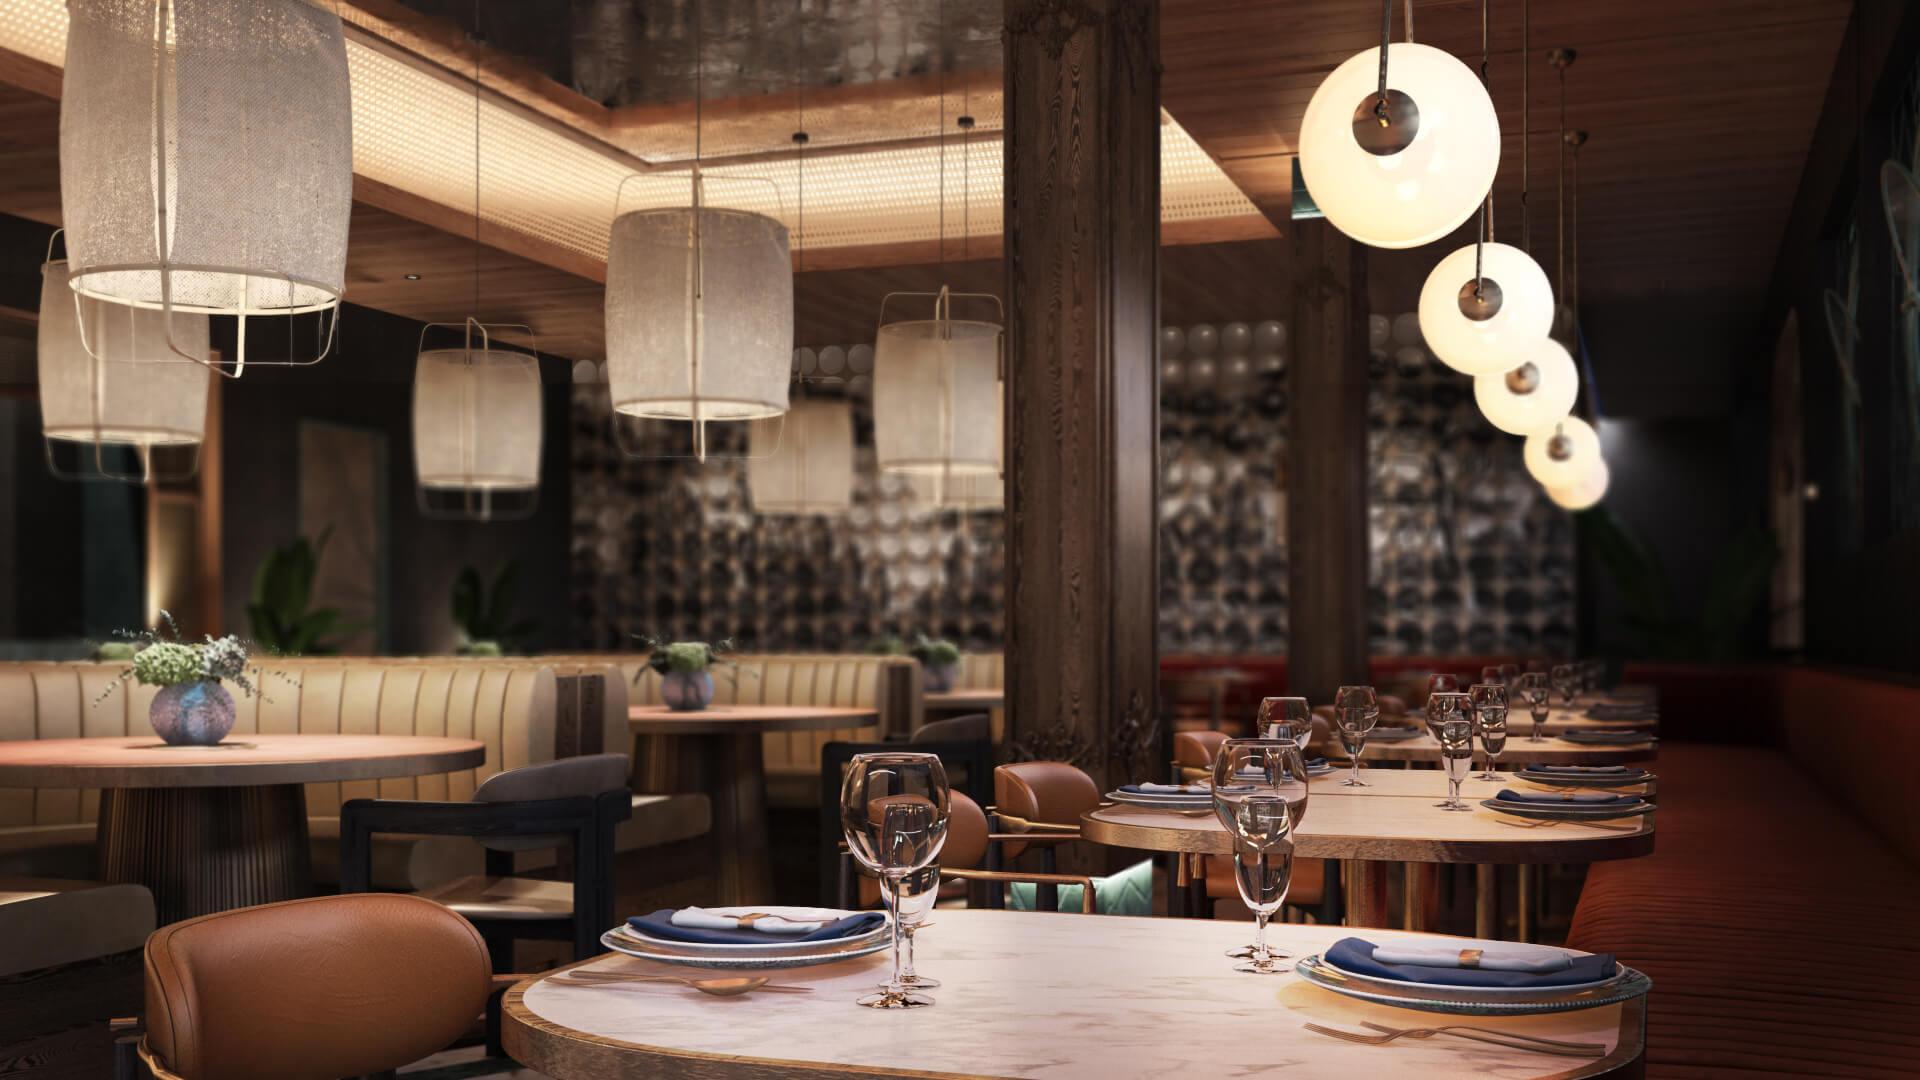 CG Render of a Restaurant Interior